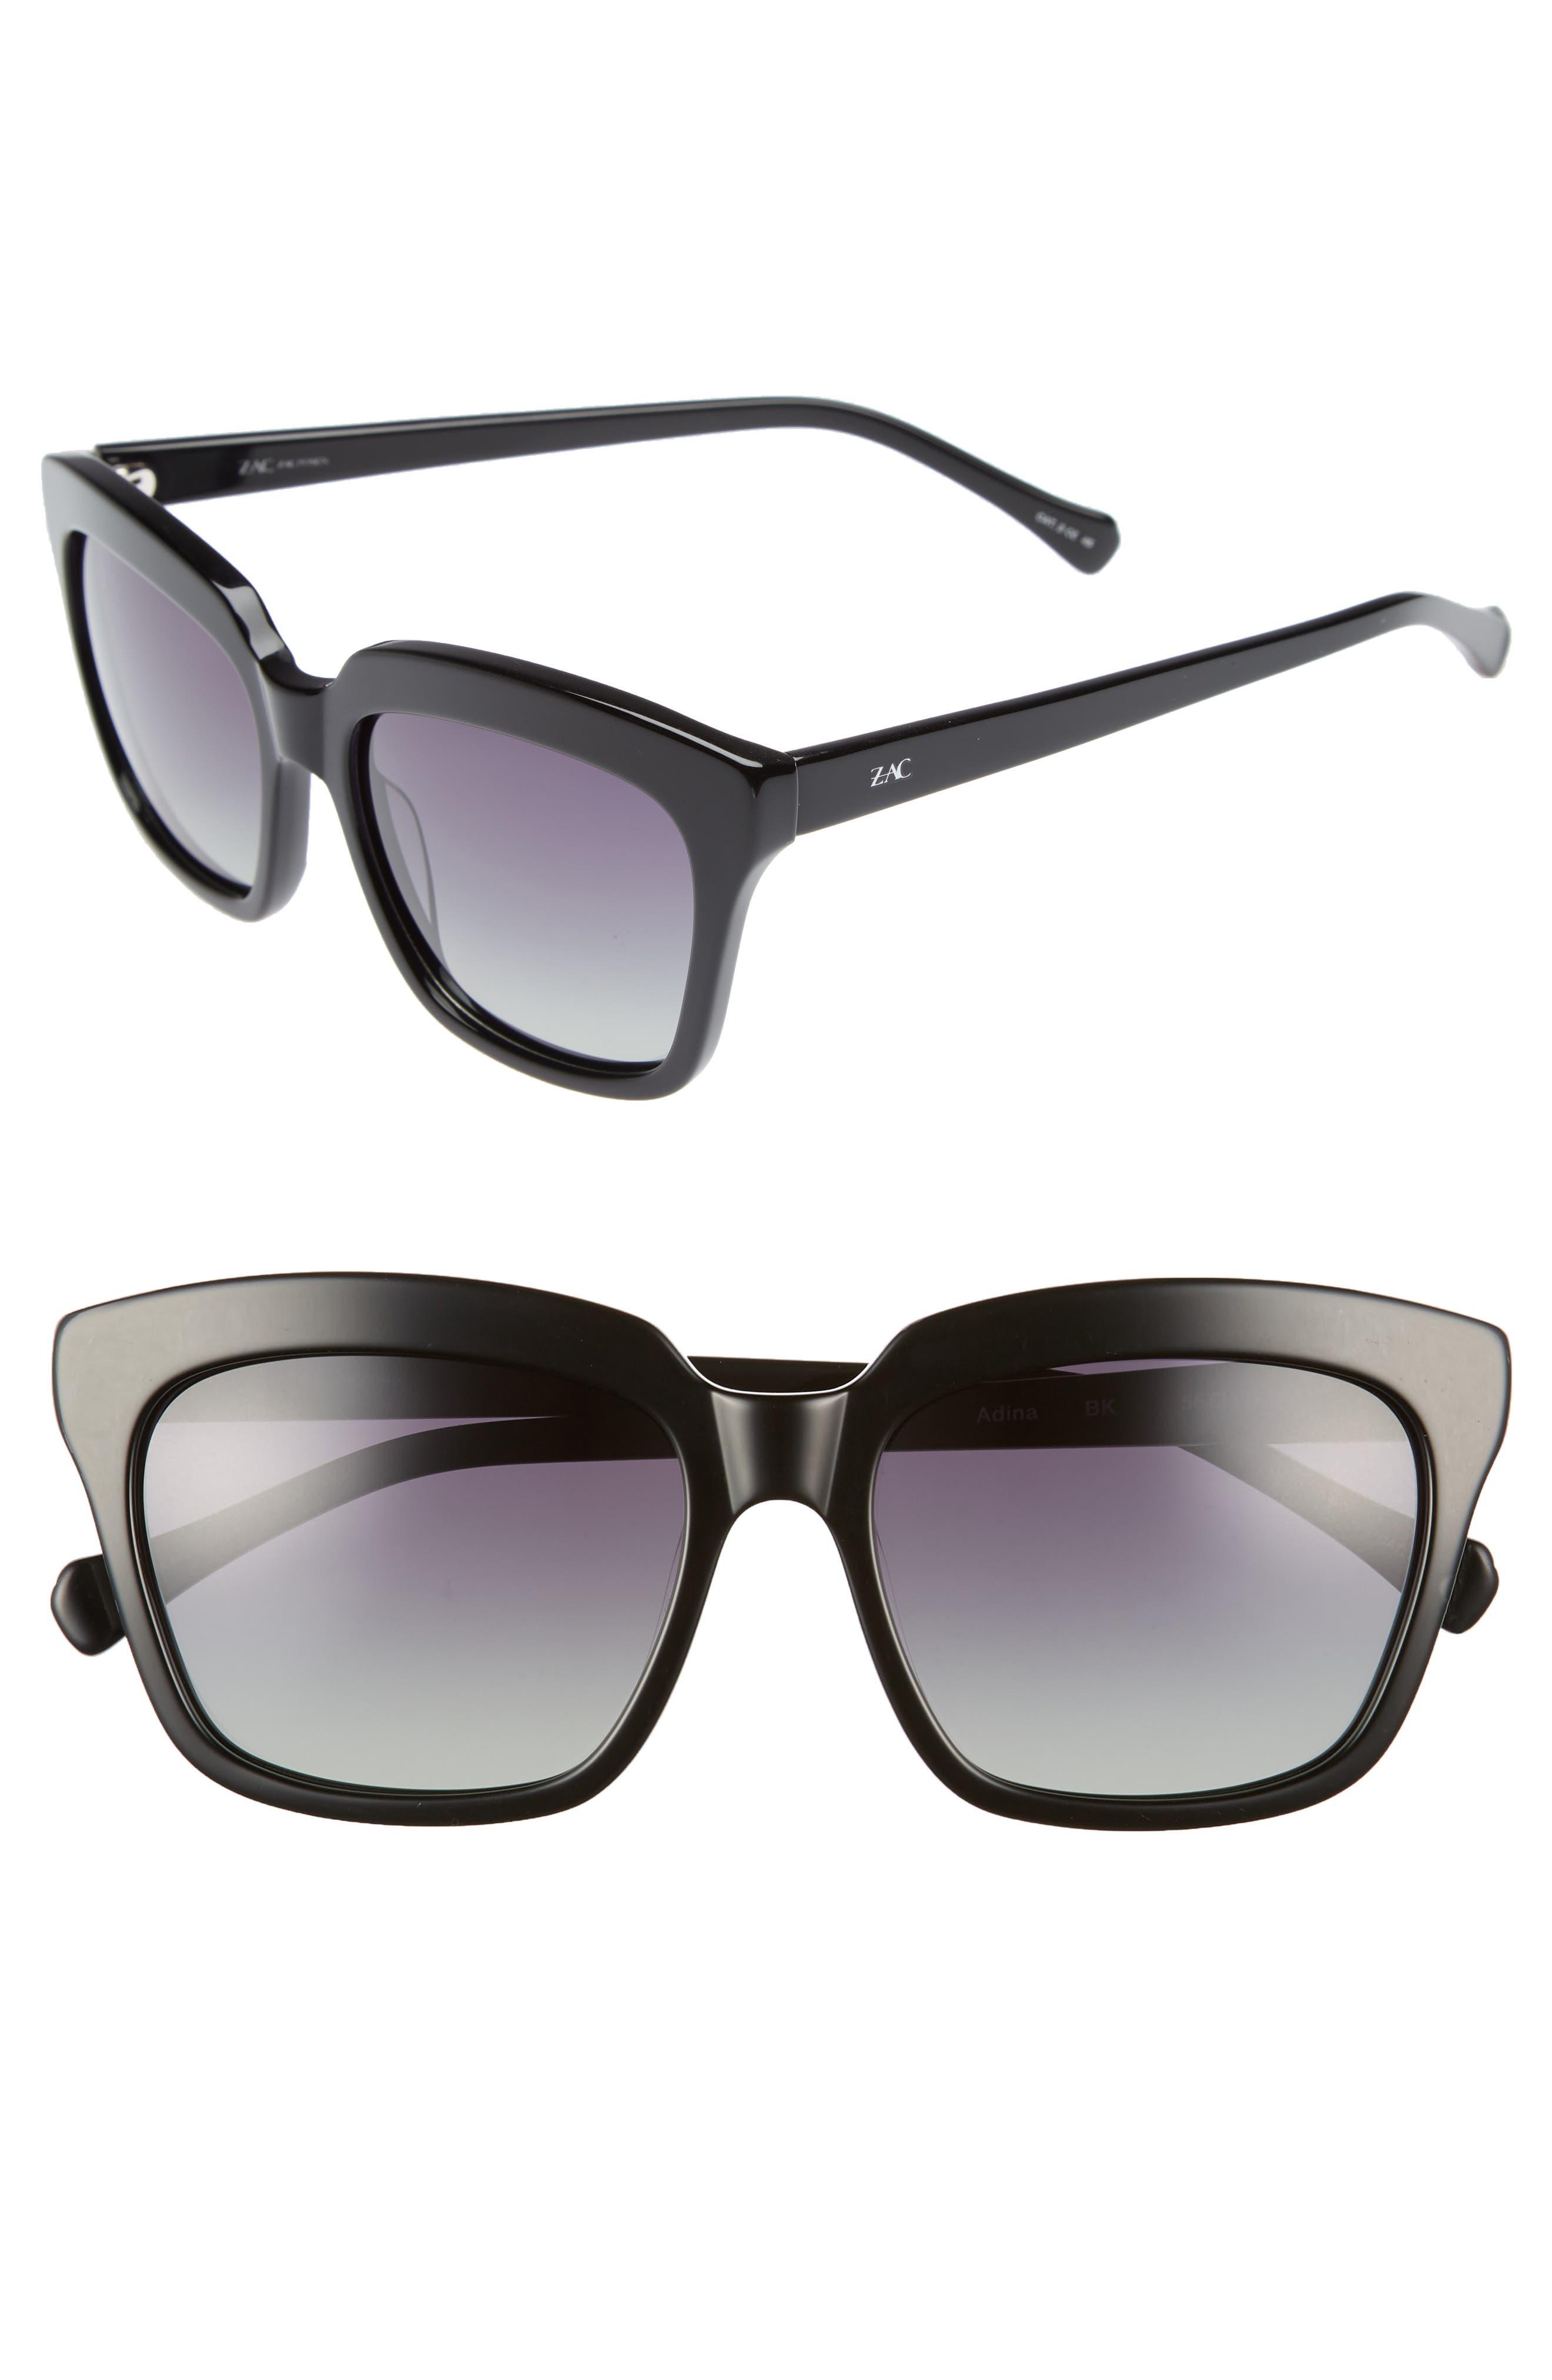 Adina 56mm Polarized Sunglasses,                             Main thumbnail 1, color,                             001